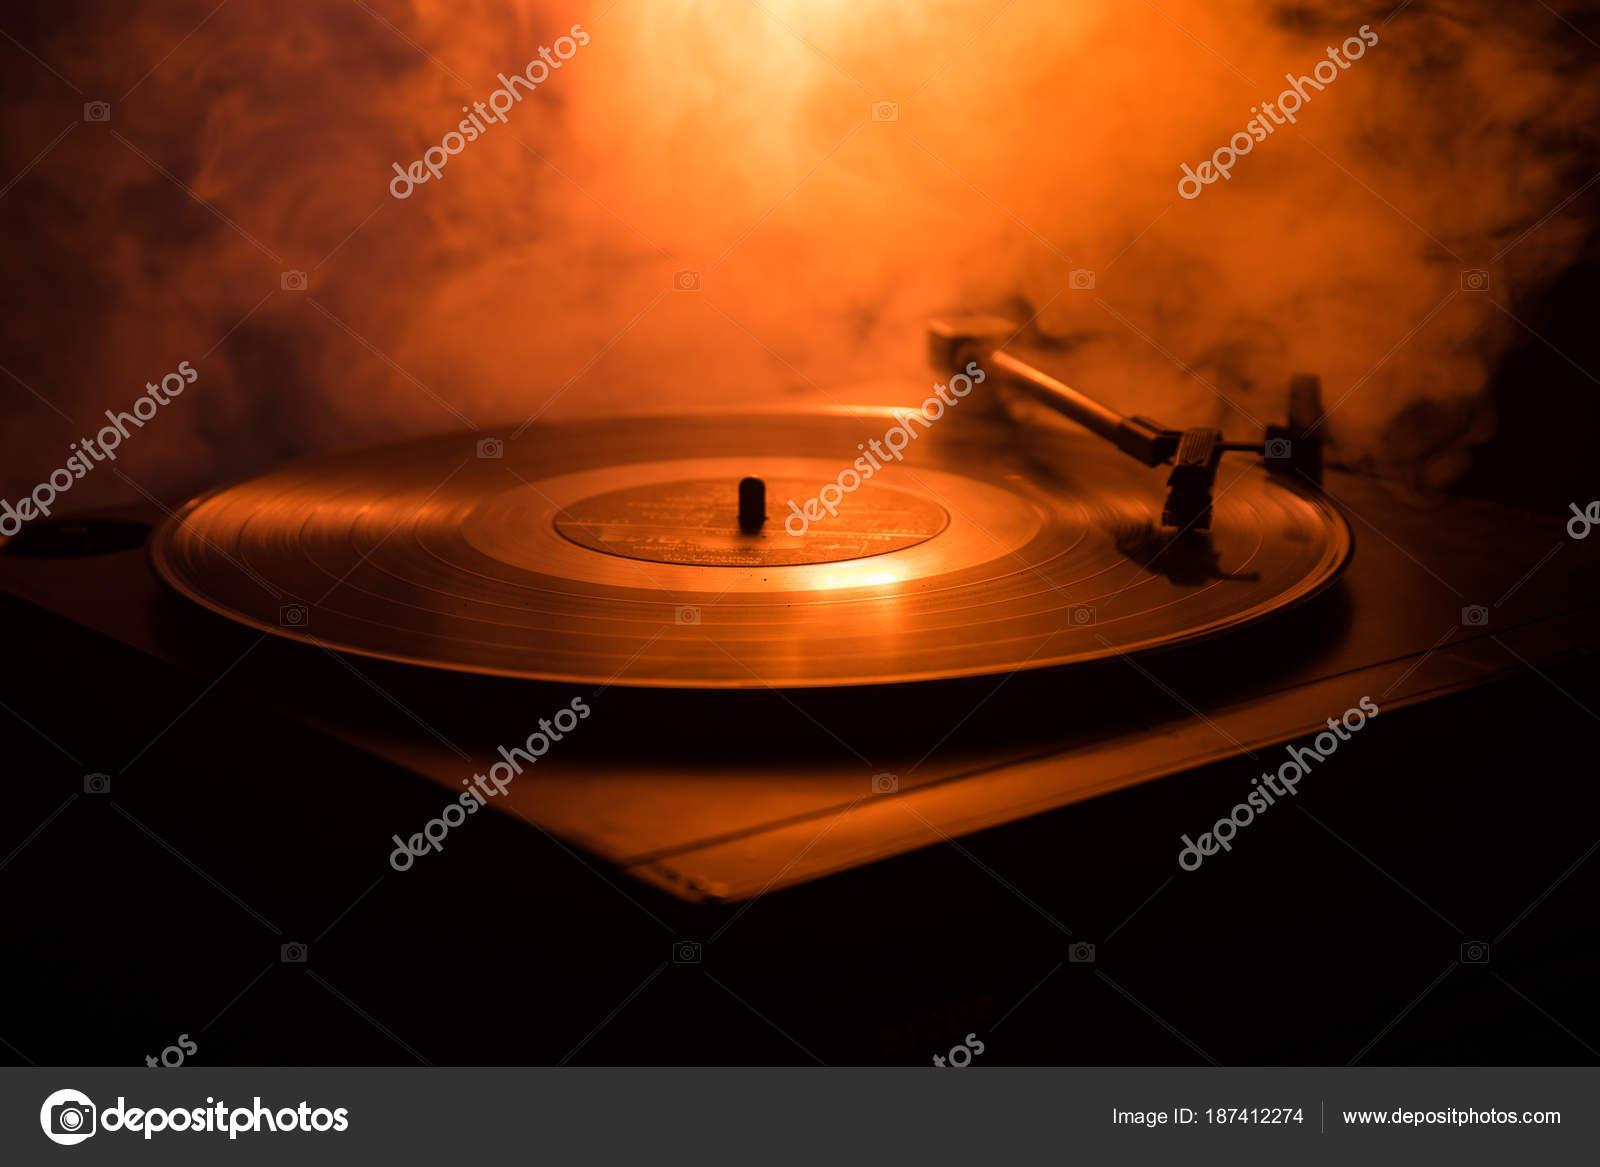 Turntable vinyl record player  Retro audio equipment for